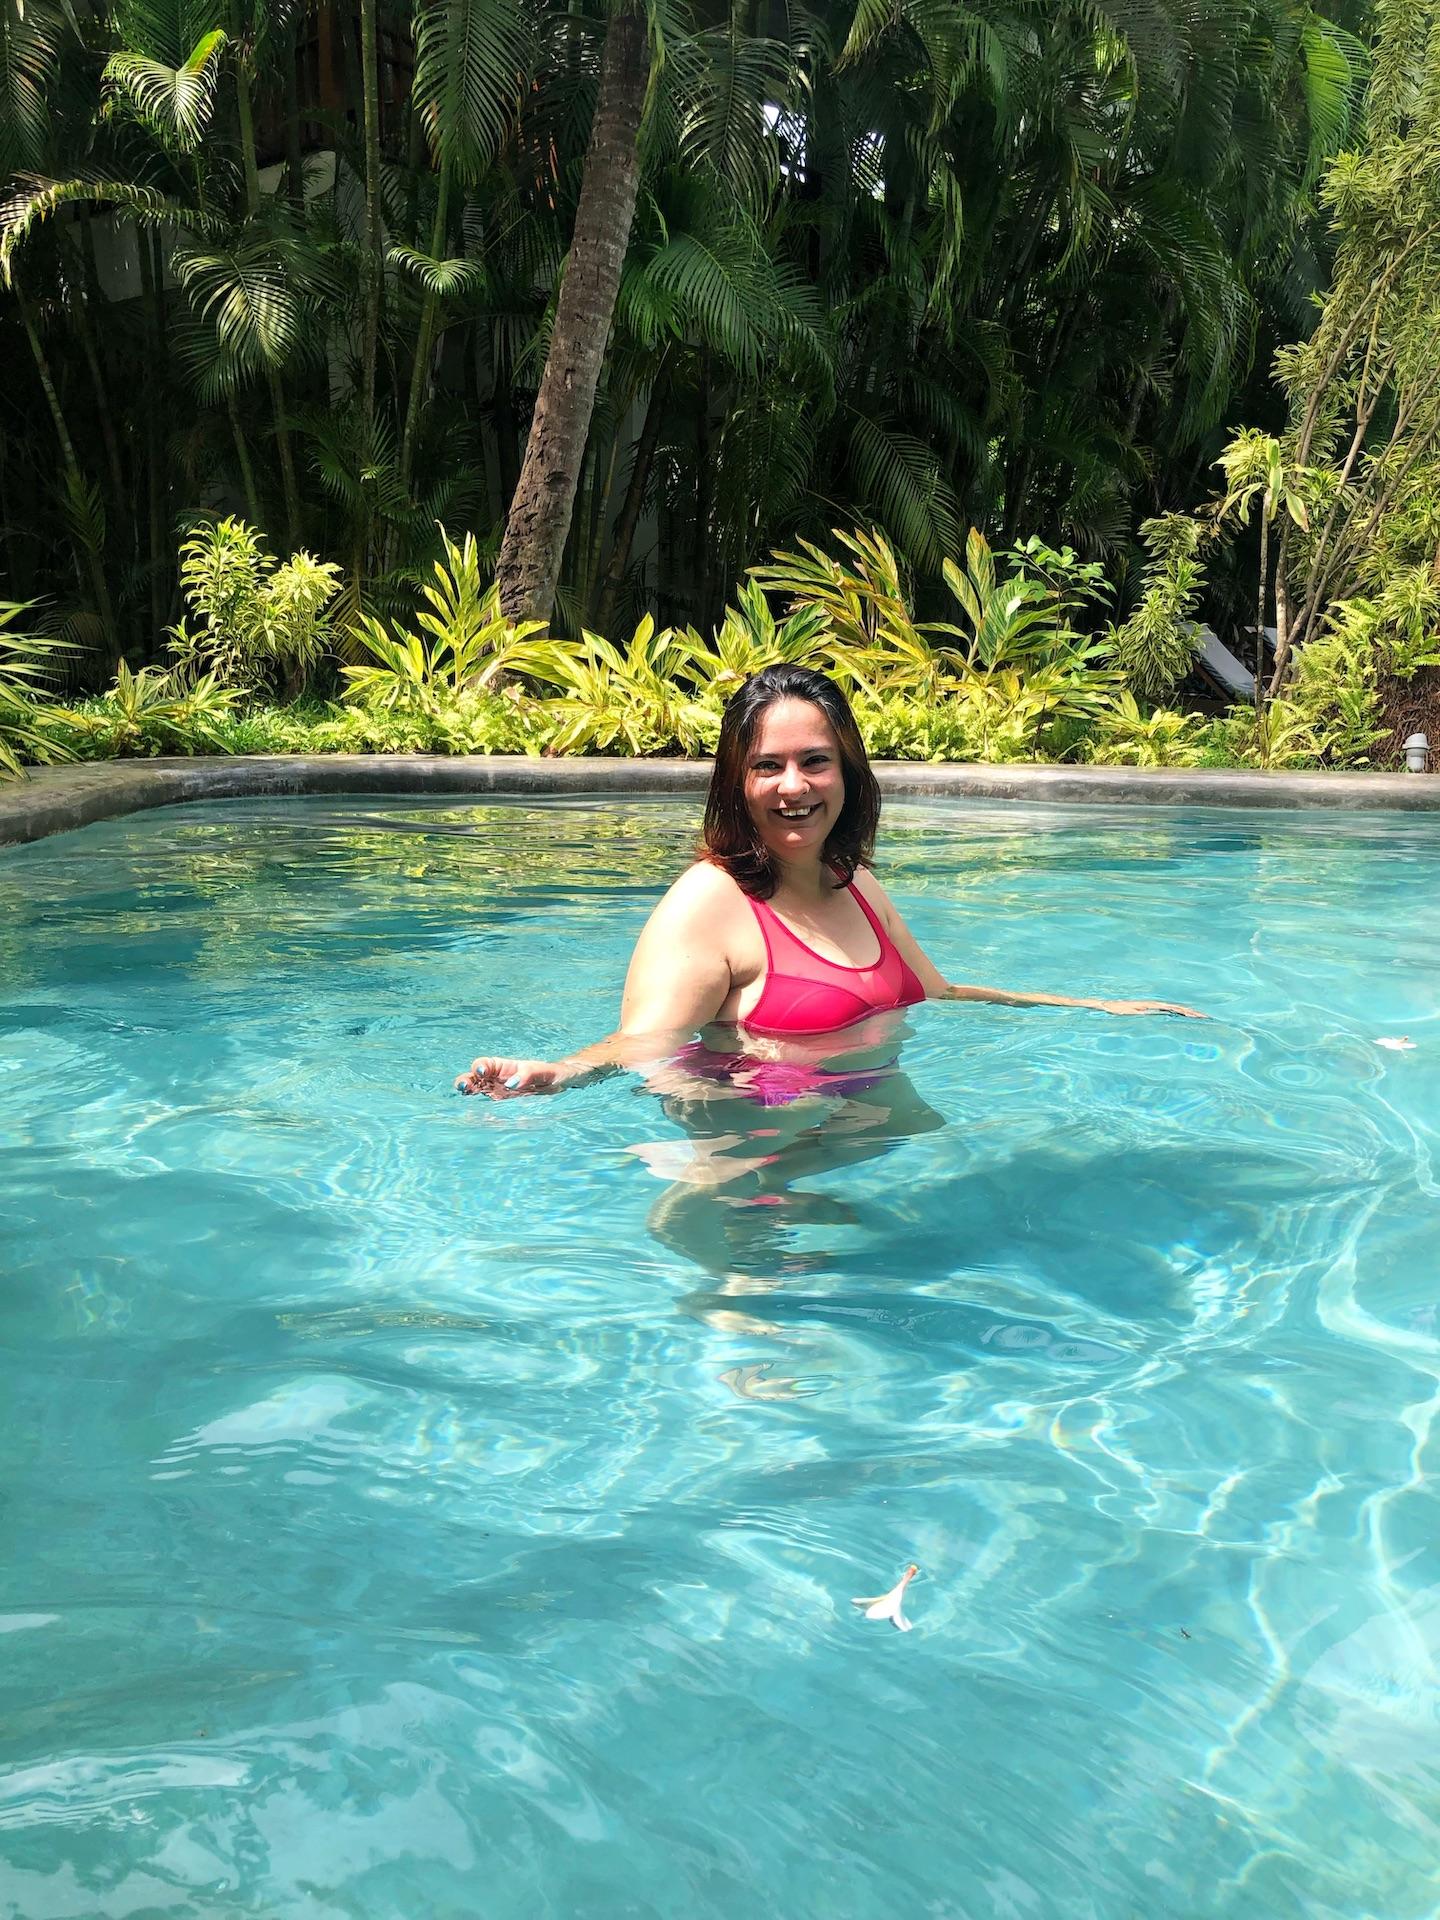 A Rejuvenating SpaCation at Coco Shambhala, Goa